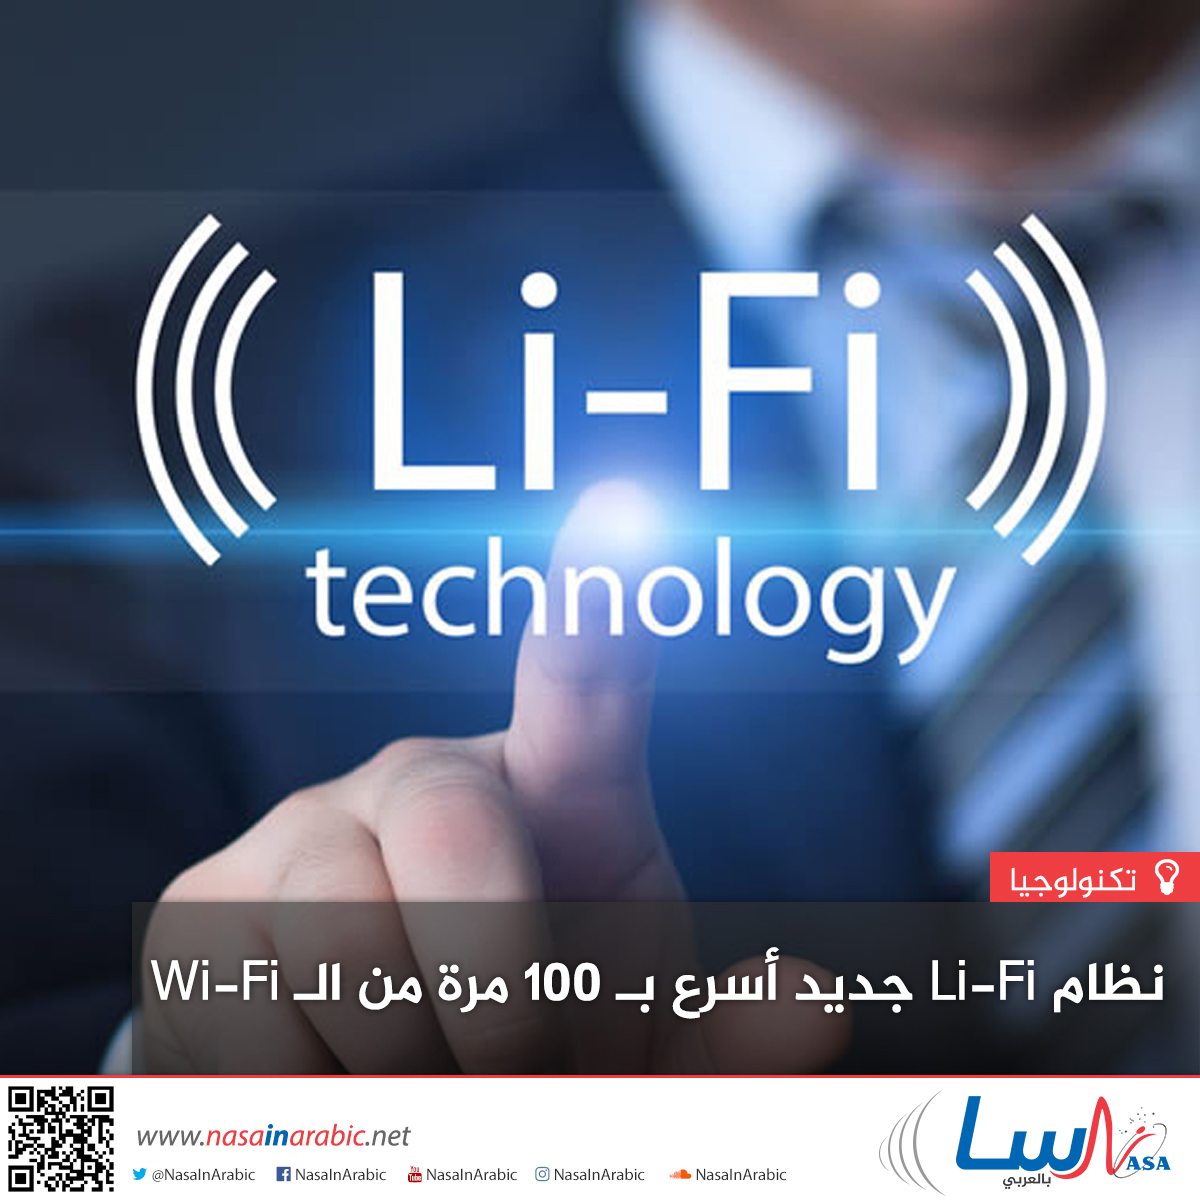 نظام Li-Fi جديد أسرع بـ 100 مرة من الـ Wi-Fi